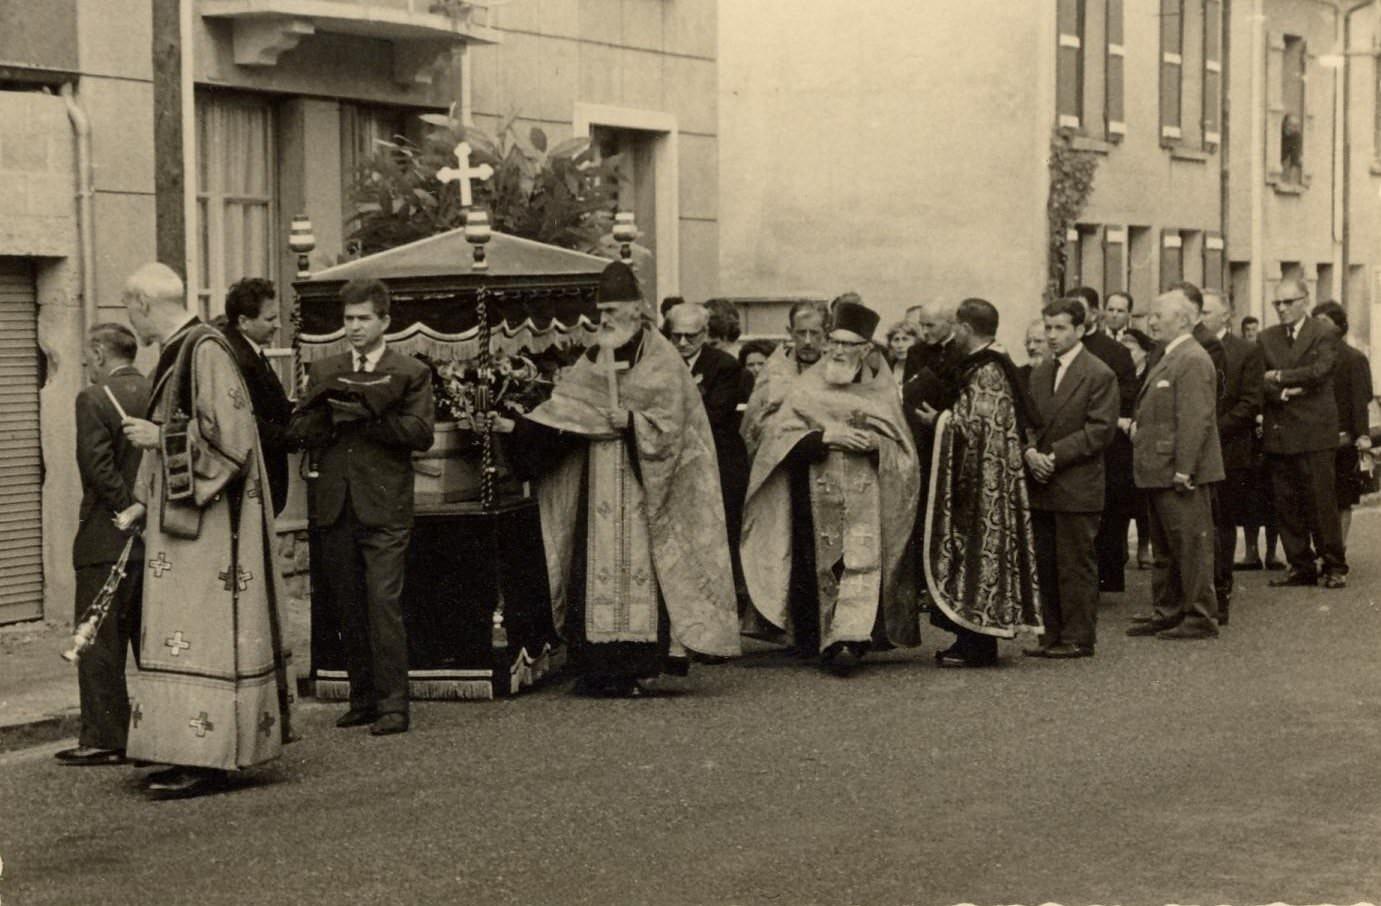 Mitropolitul Visarion Puiu - procesiunea de inmormantare hp 4